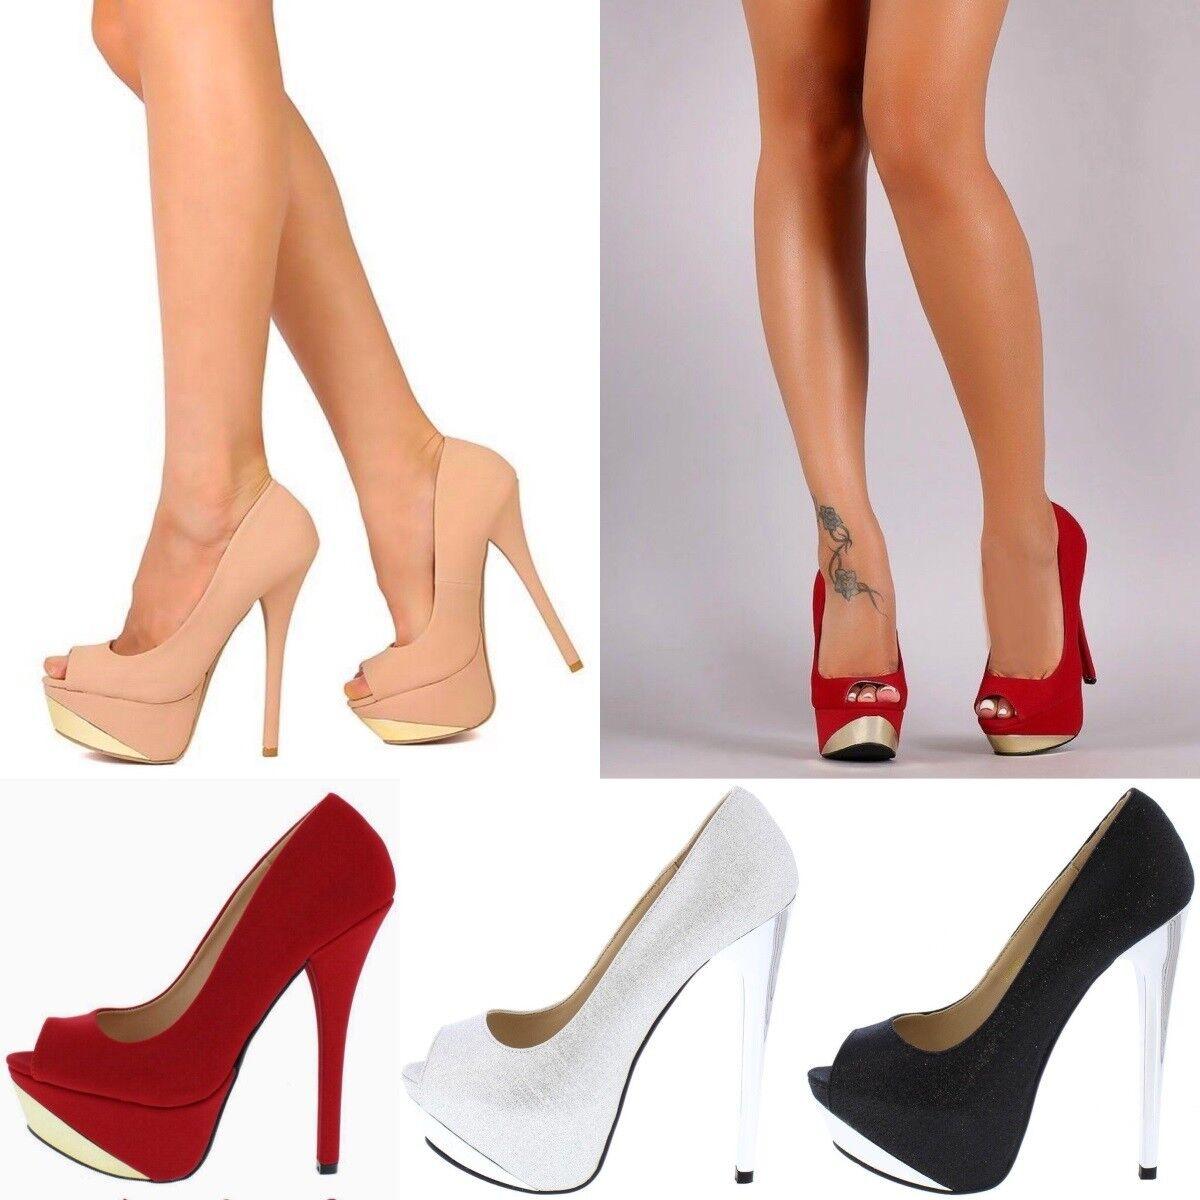 "Sexy 6"" Open Peep Toe Exotic wear Stiletto High Heels Platform Pumps Size H191"